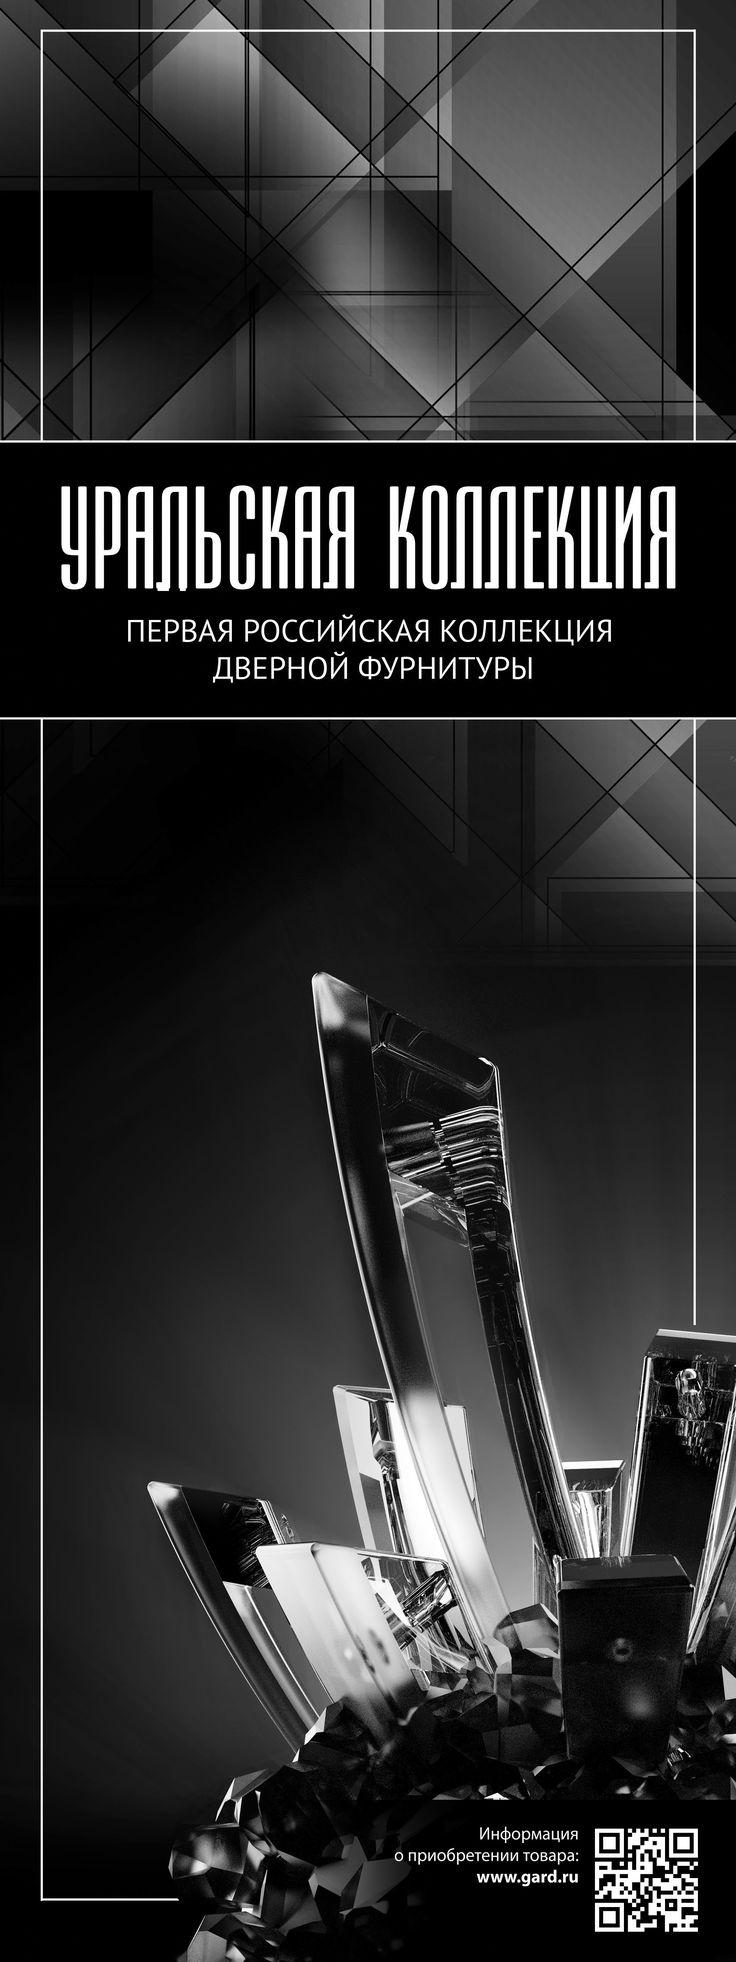 Ознакомьтесь с моим проектом @Behance: «Ural Collection» https://www.behance.net/gallery/44264229/Ural-Collection